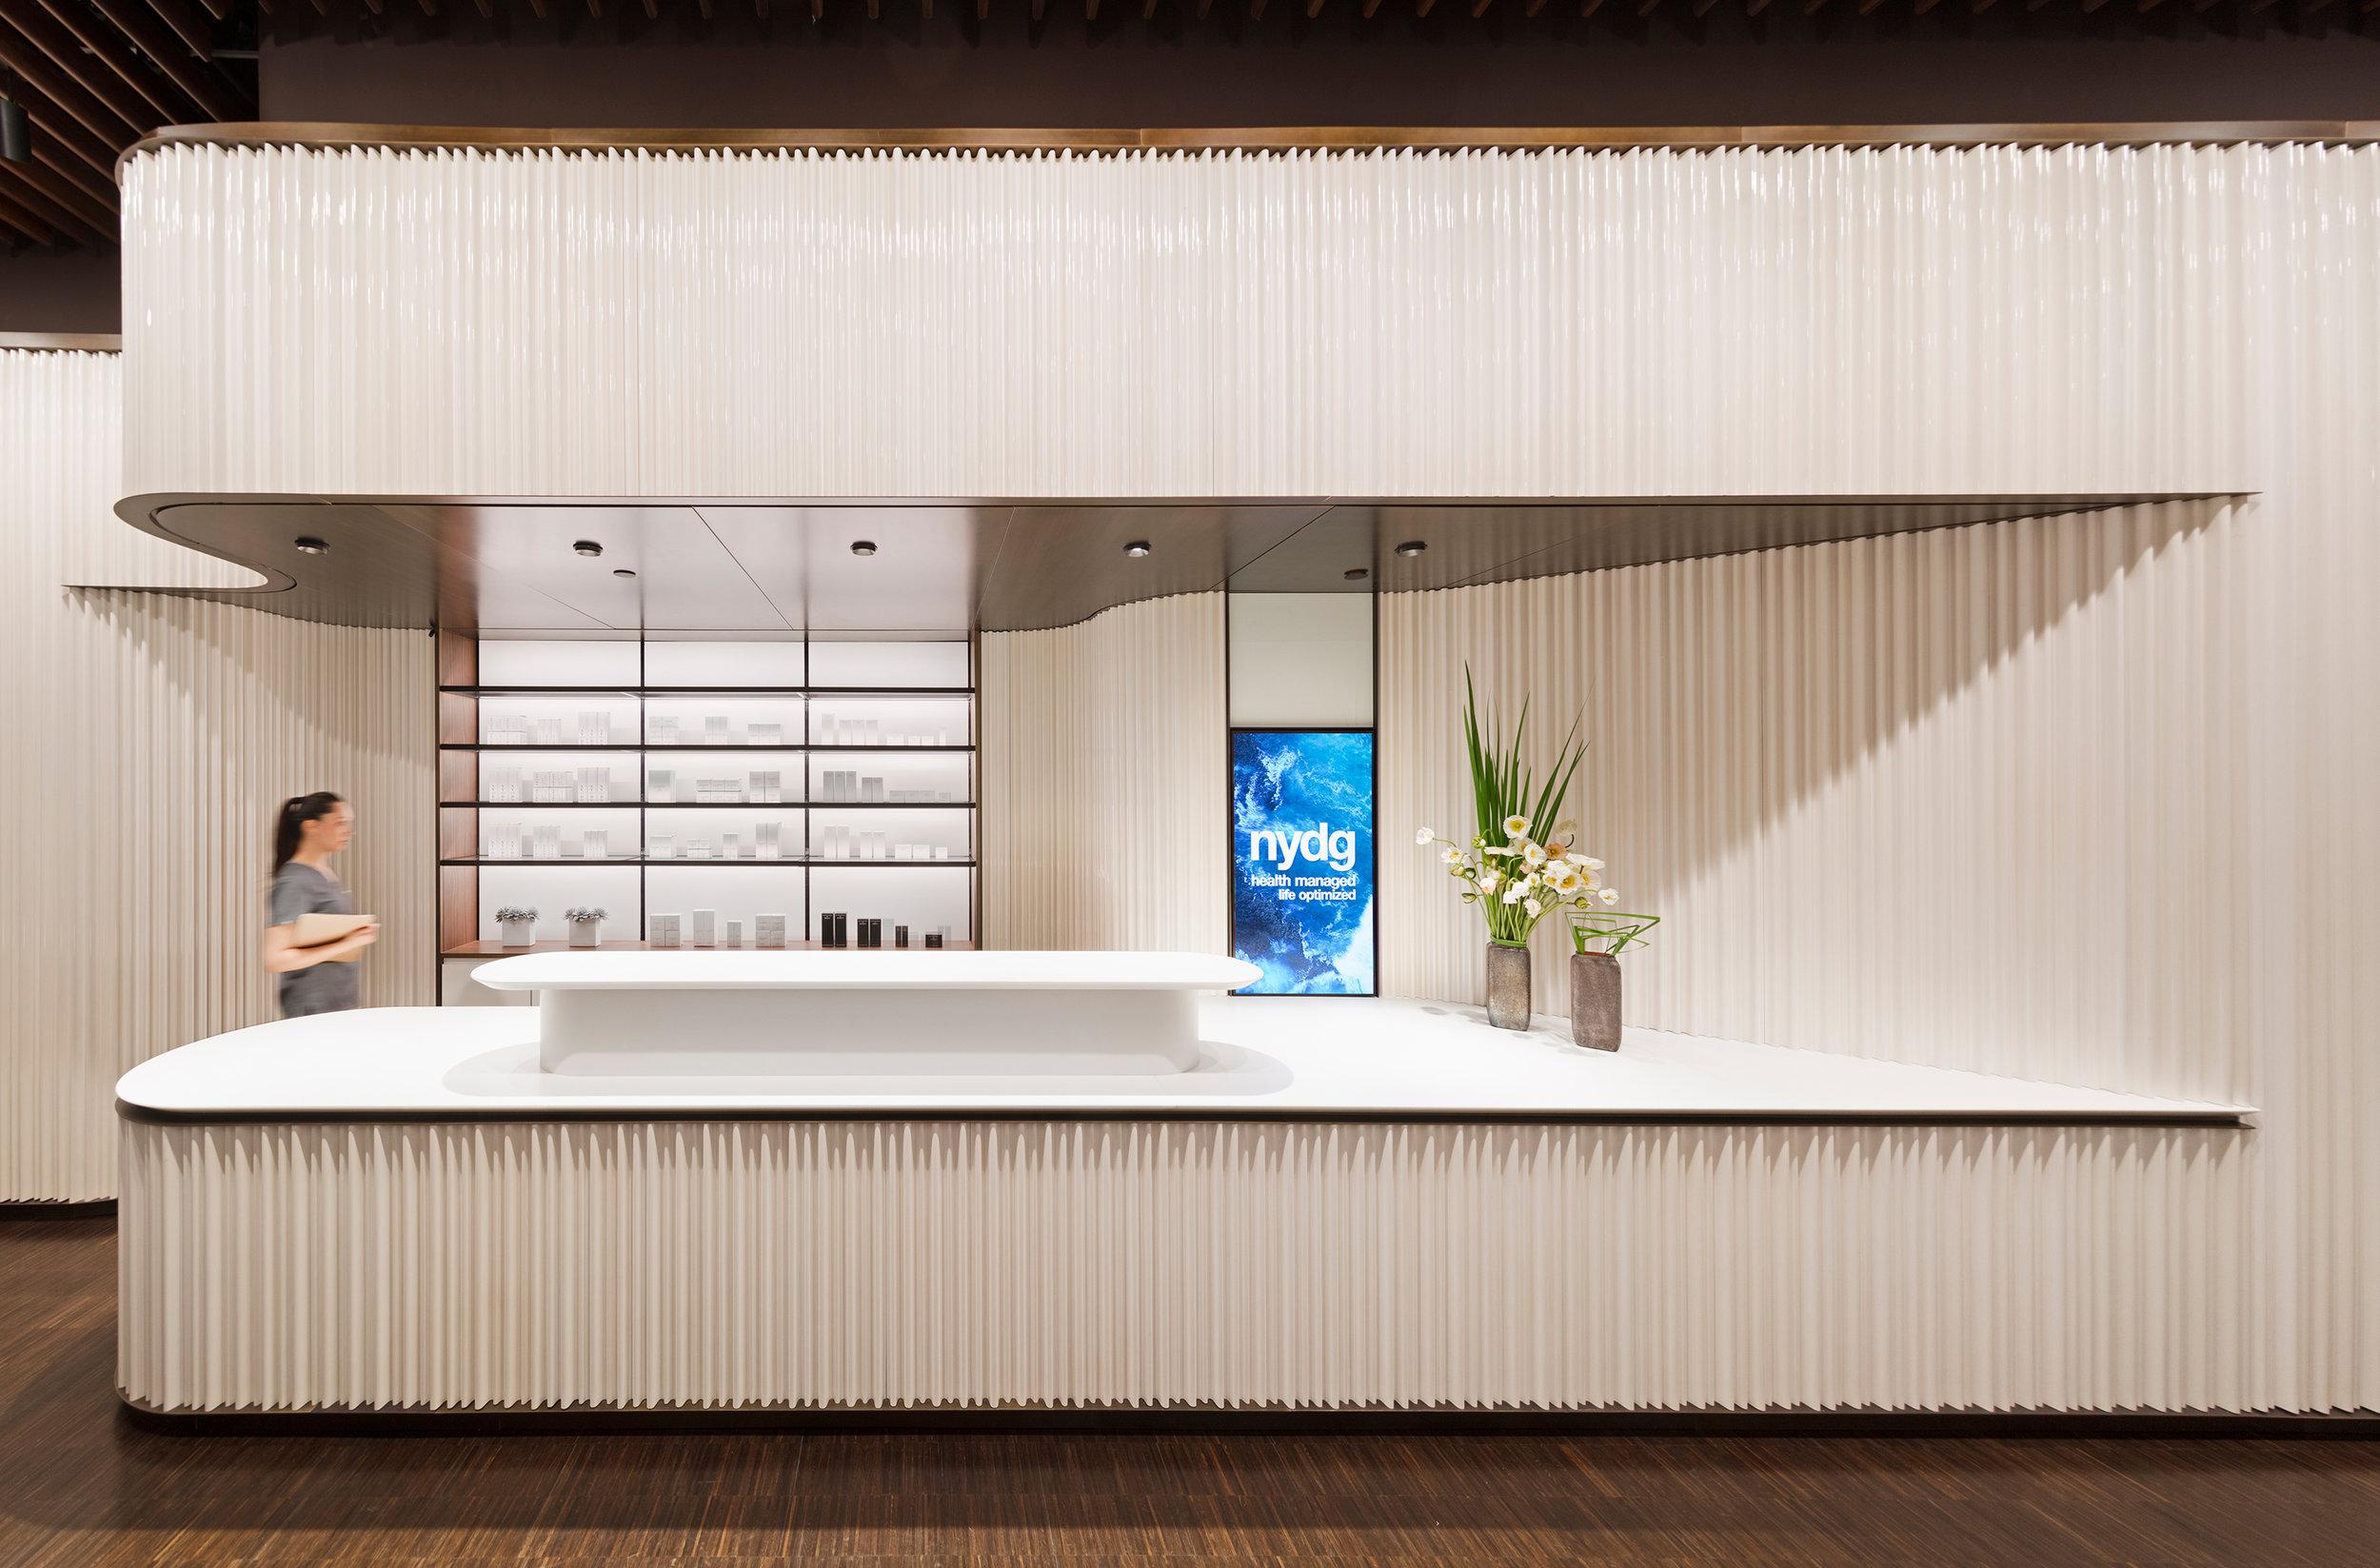 © Albert Vecerka/Esto.New York Dermatology Group, New York NY for Brandon Haw Architecture.